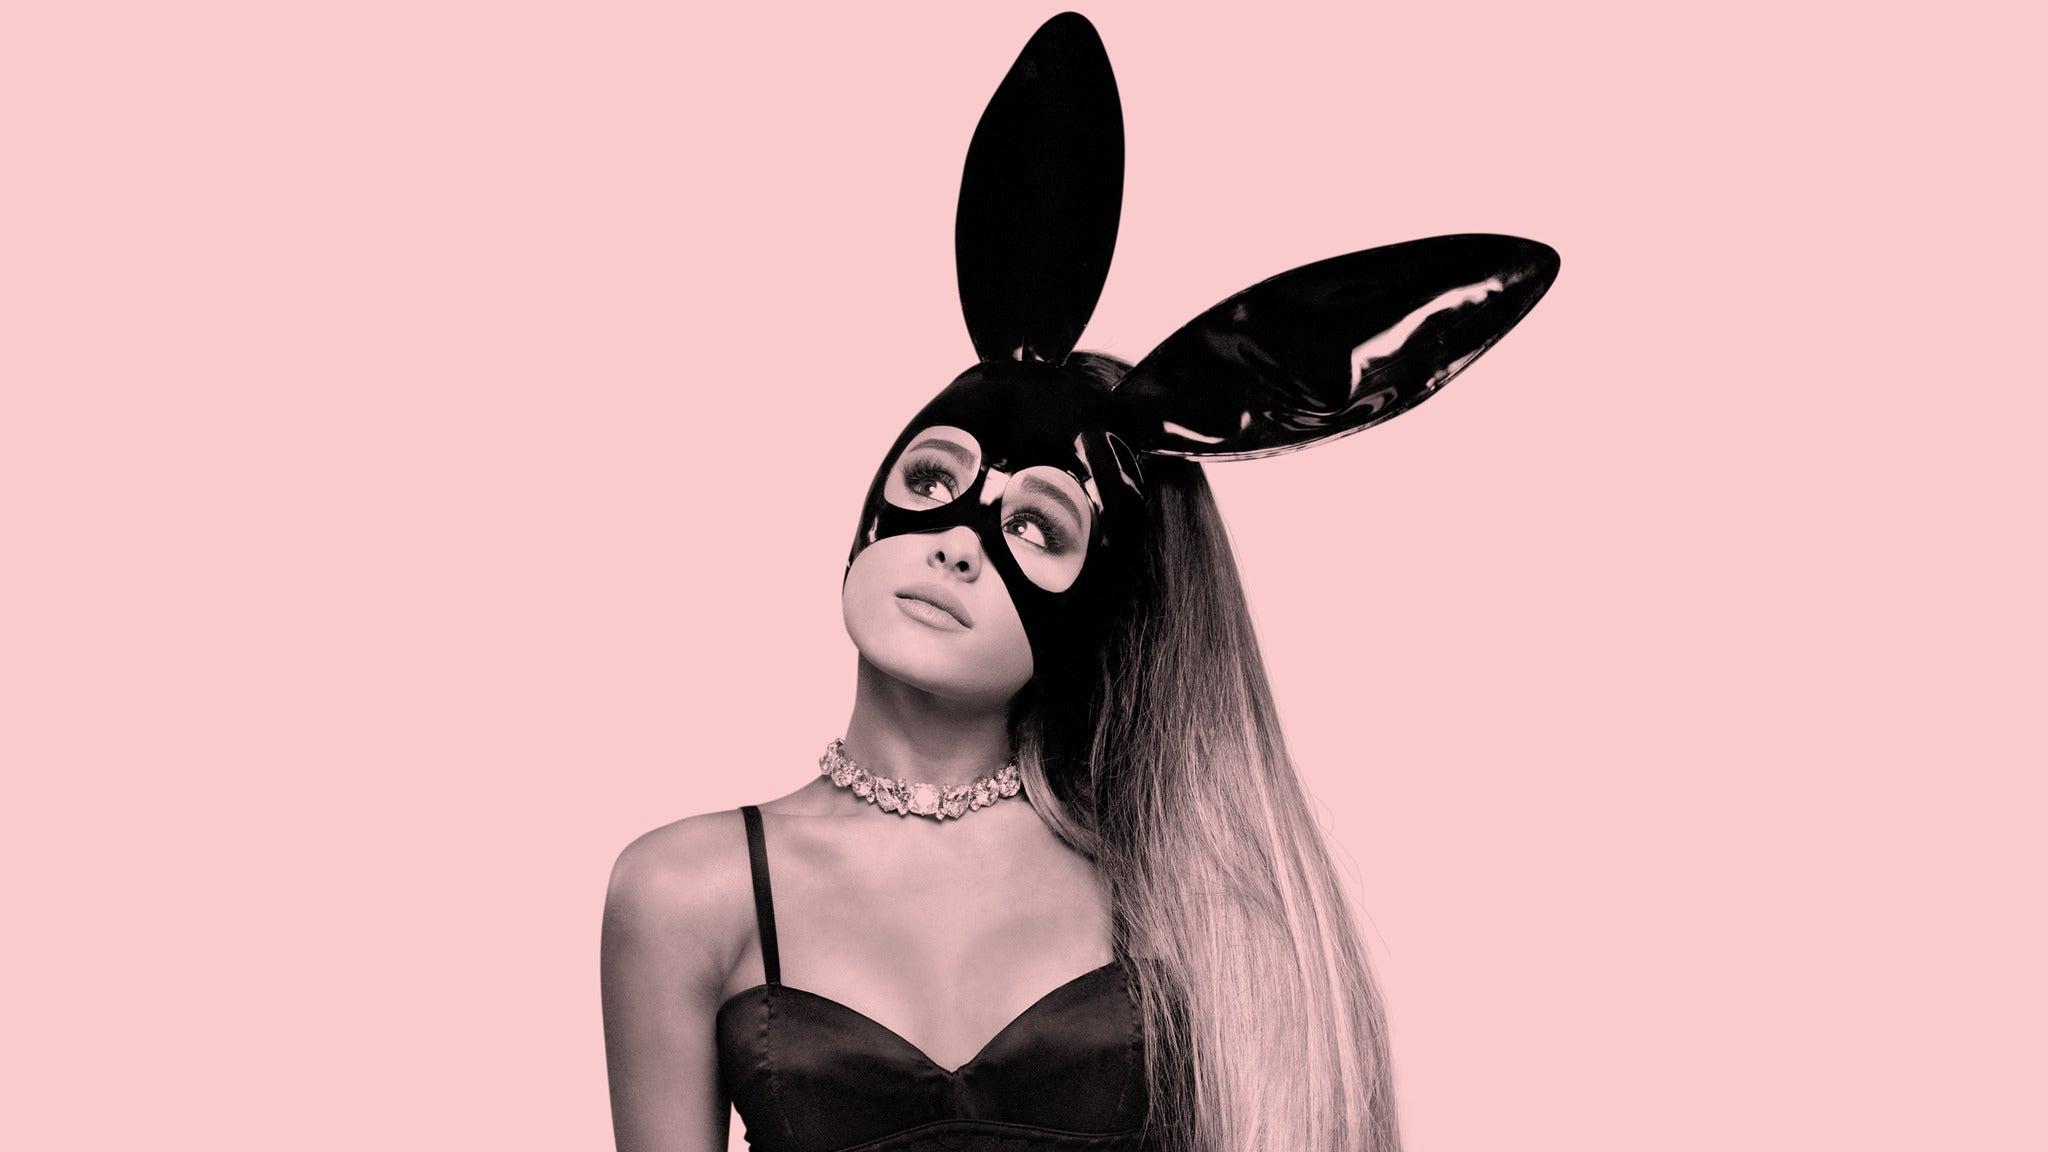 Ariana Grande: Dangerous Woman Tour at Mohegan Sun Arena